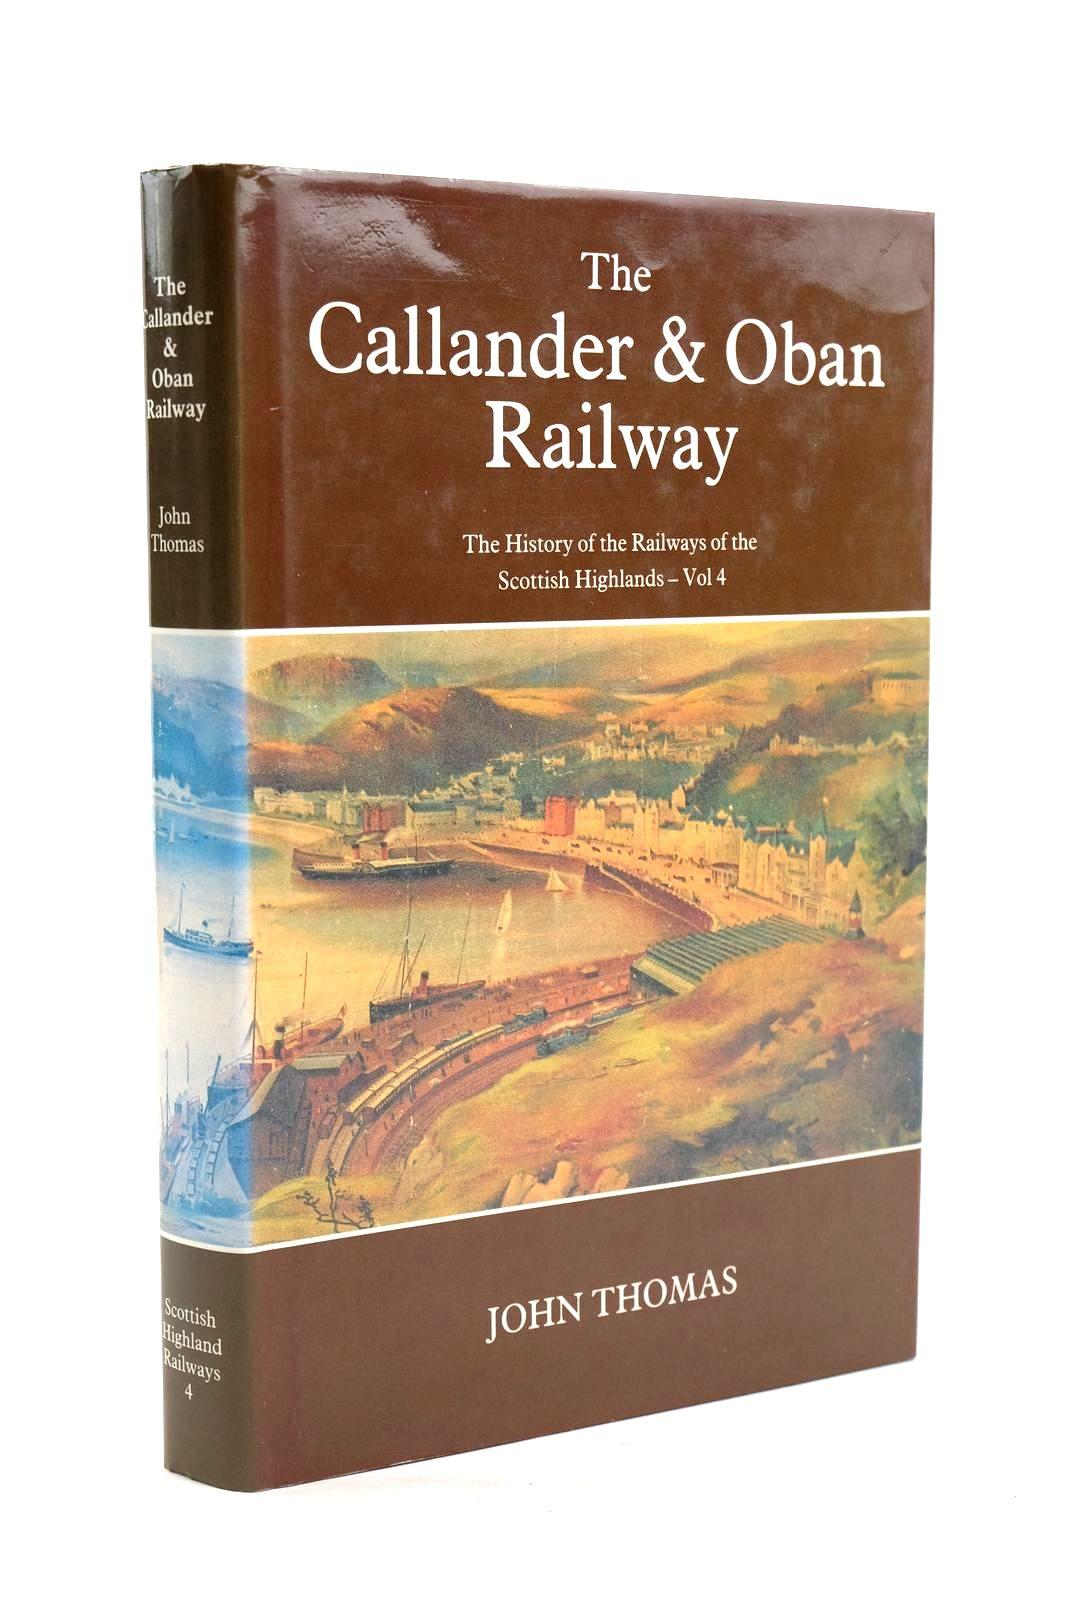 Photo of THE CALLANDER & OBAN RAILWAY written by Thomas, John Farrington, John published by David St John Thomas, David & Charles (STOCK CODE: 1319920)  for sale by Stella & Rose's Books